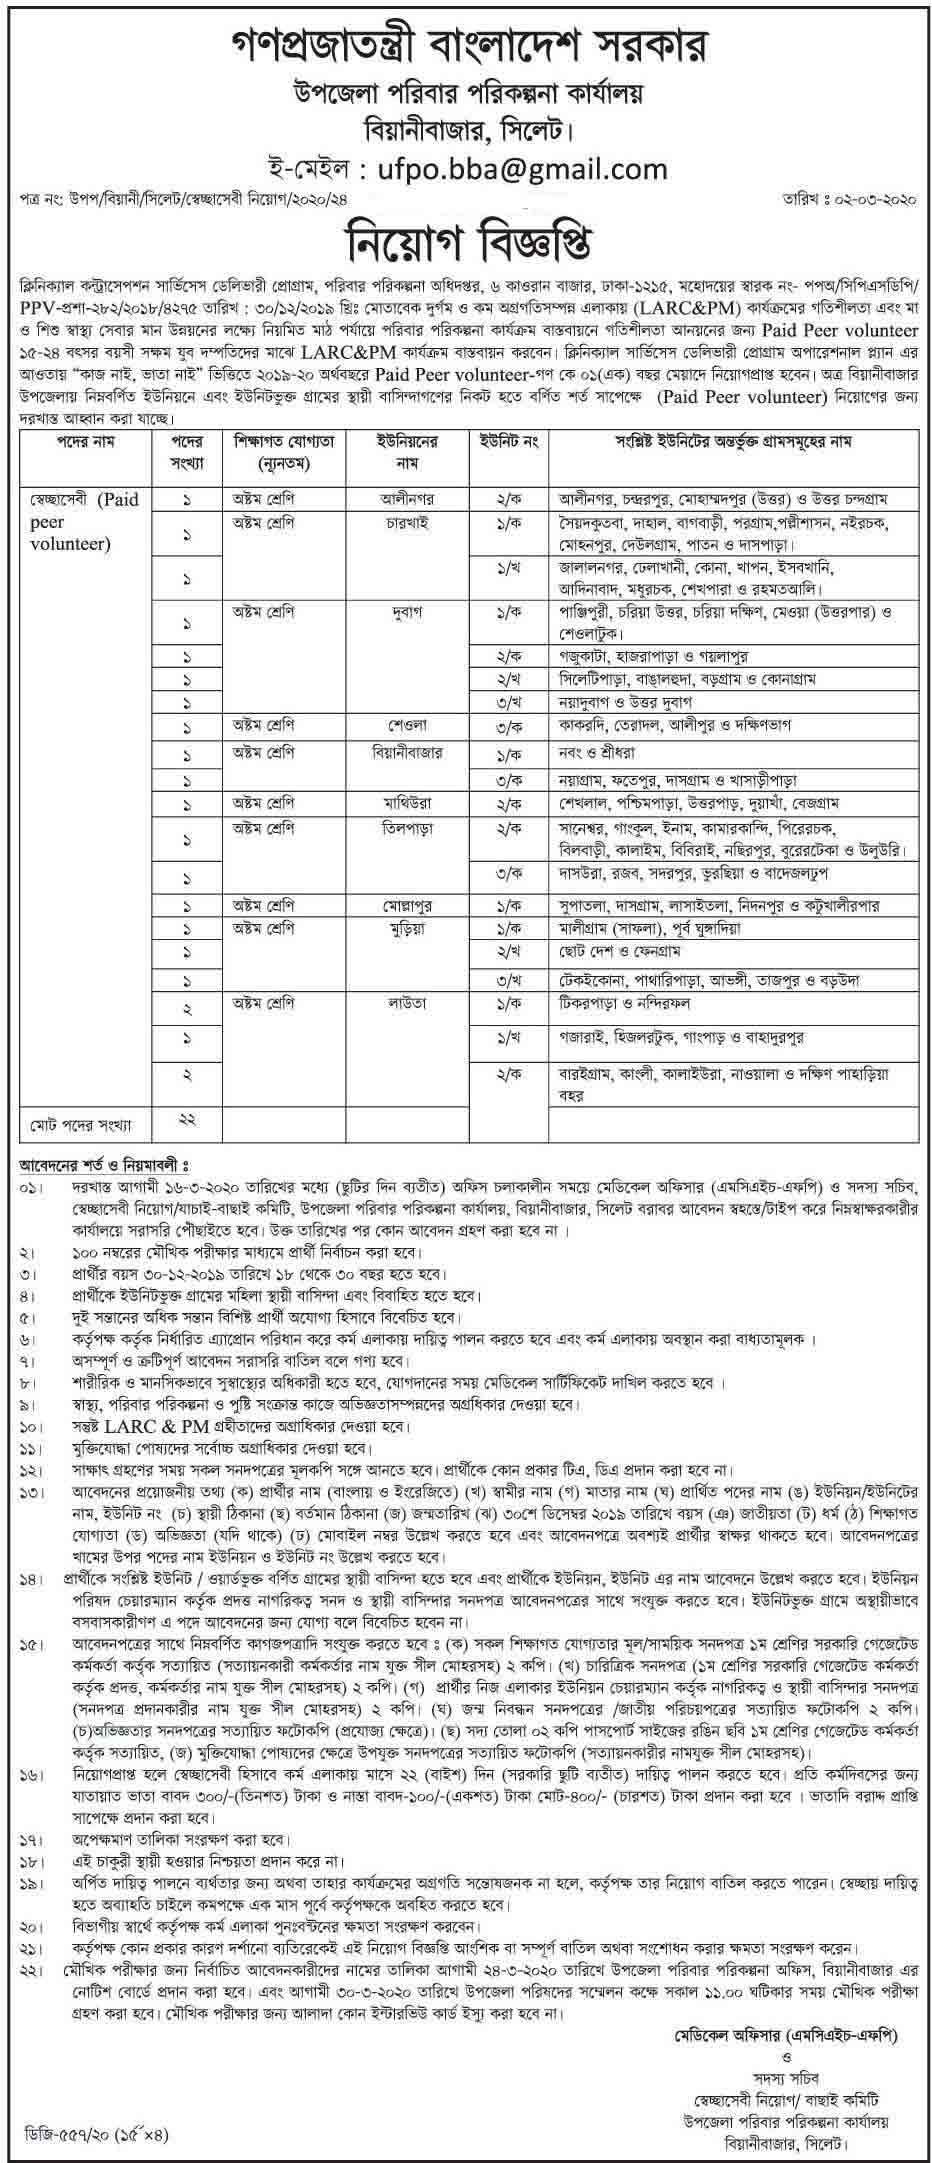 Upazila Family Planning Office Job Circular 2020 | Apply Now 1